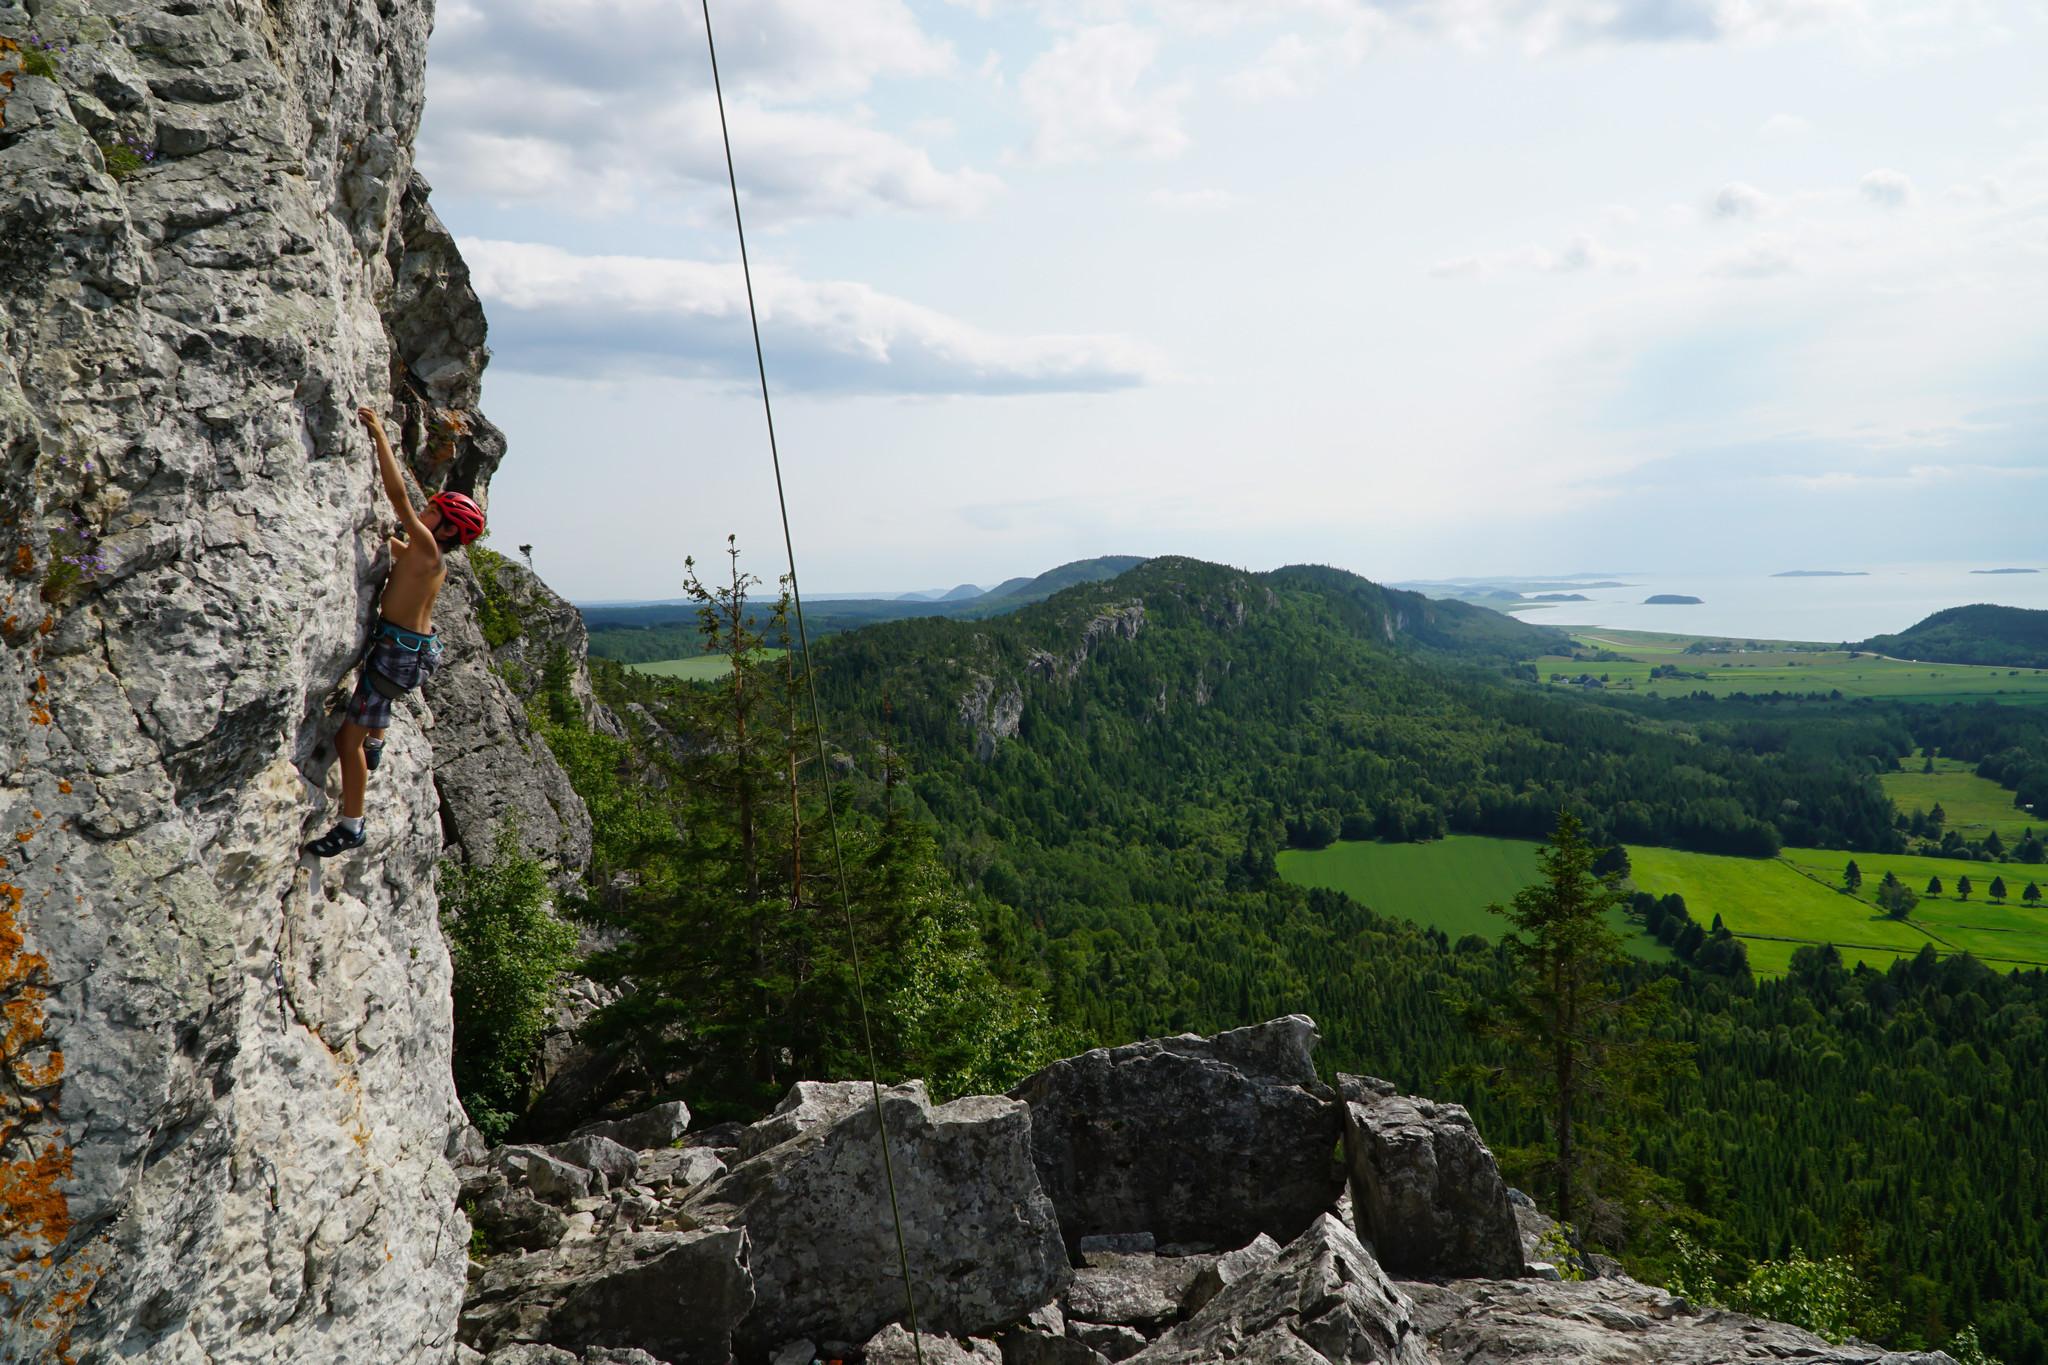 climbing in Kamouraska, Qc